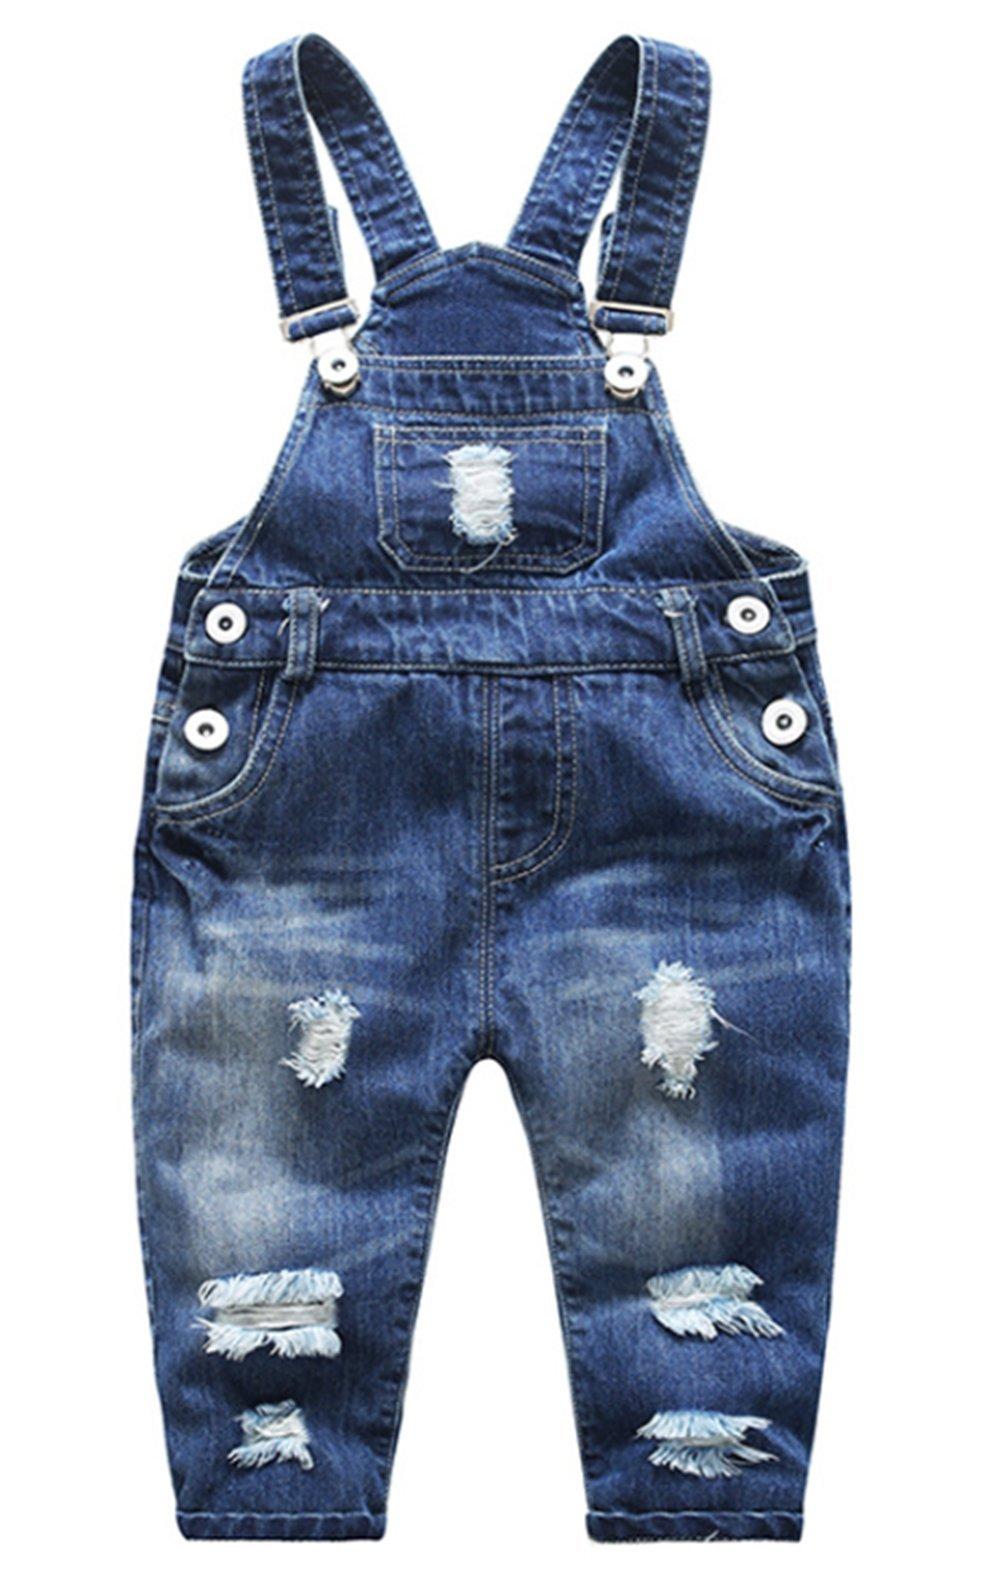 BANGELY Kids Boys Girls Casual Button Denim Overall Bib Jeans Pants (1-2Years, Dark Blue)